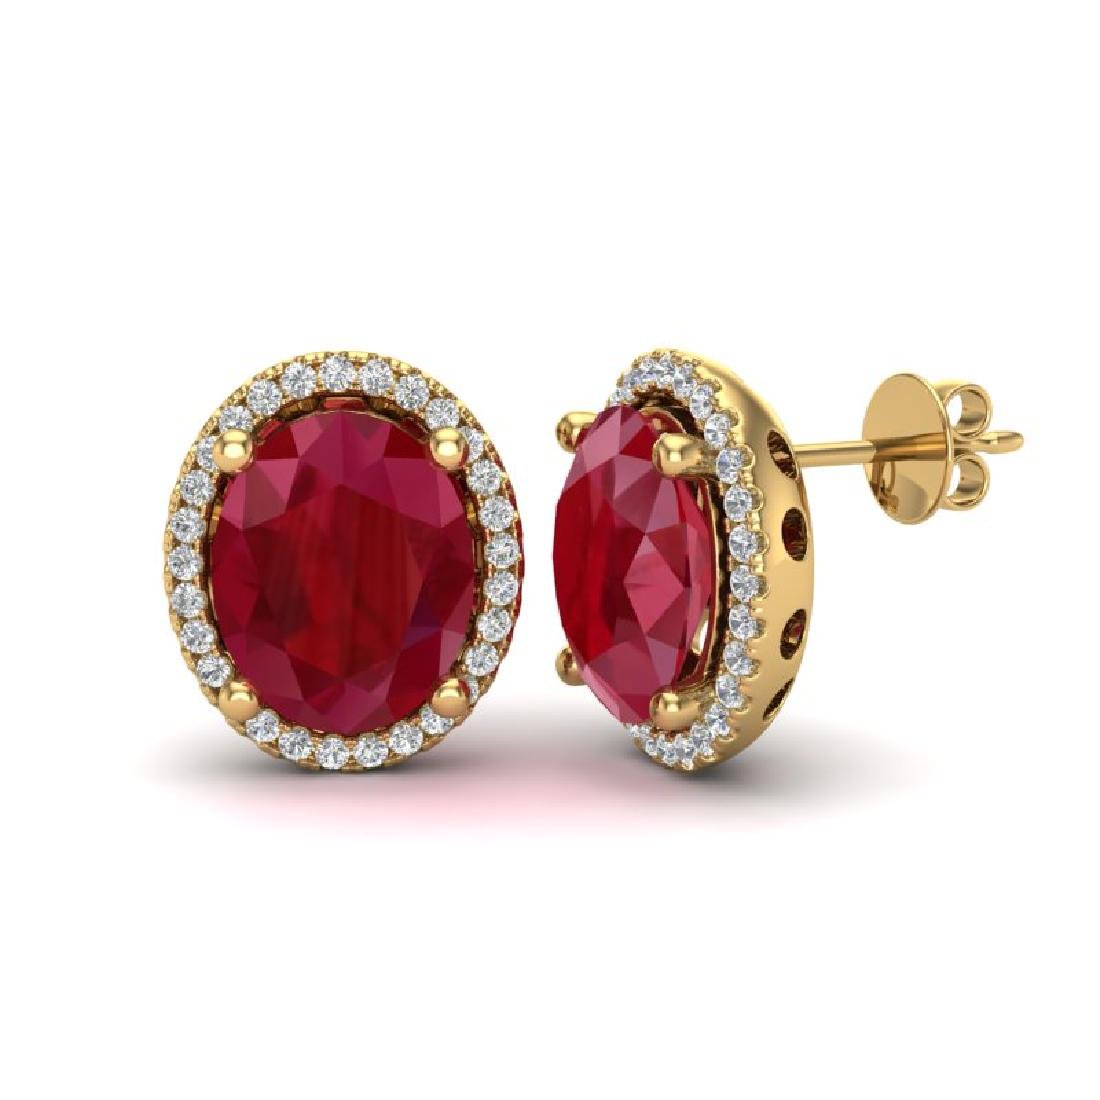 6 CTW Ruby & Micro Pave VS/SI Diamond Earrings Halo 18K - 2